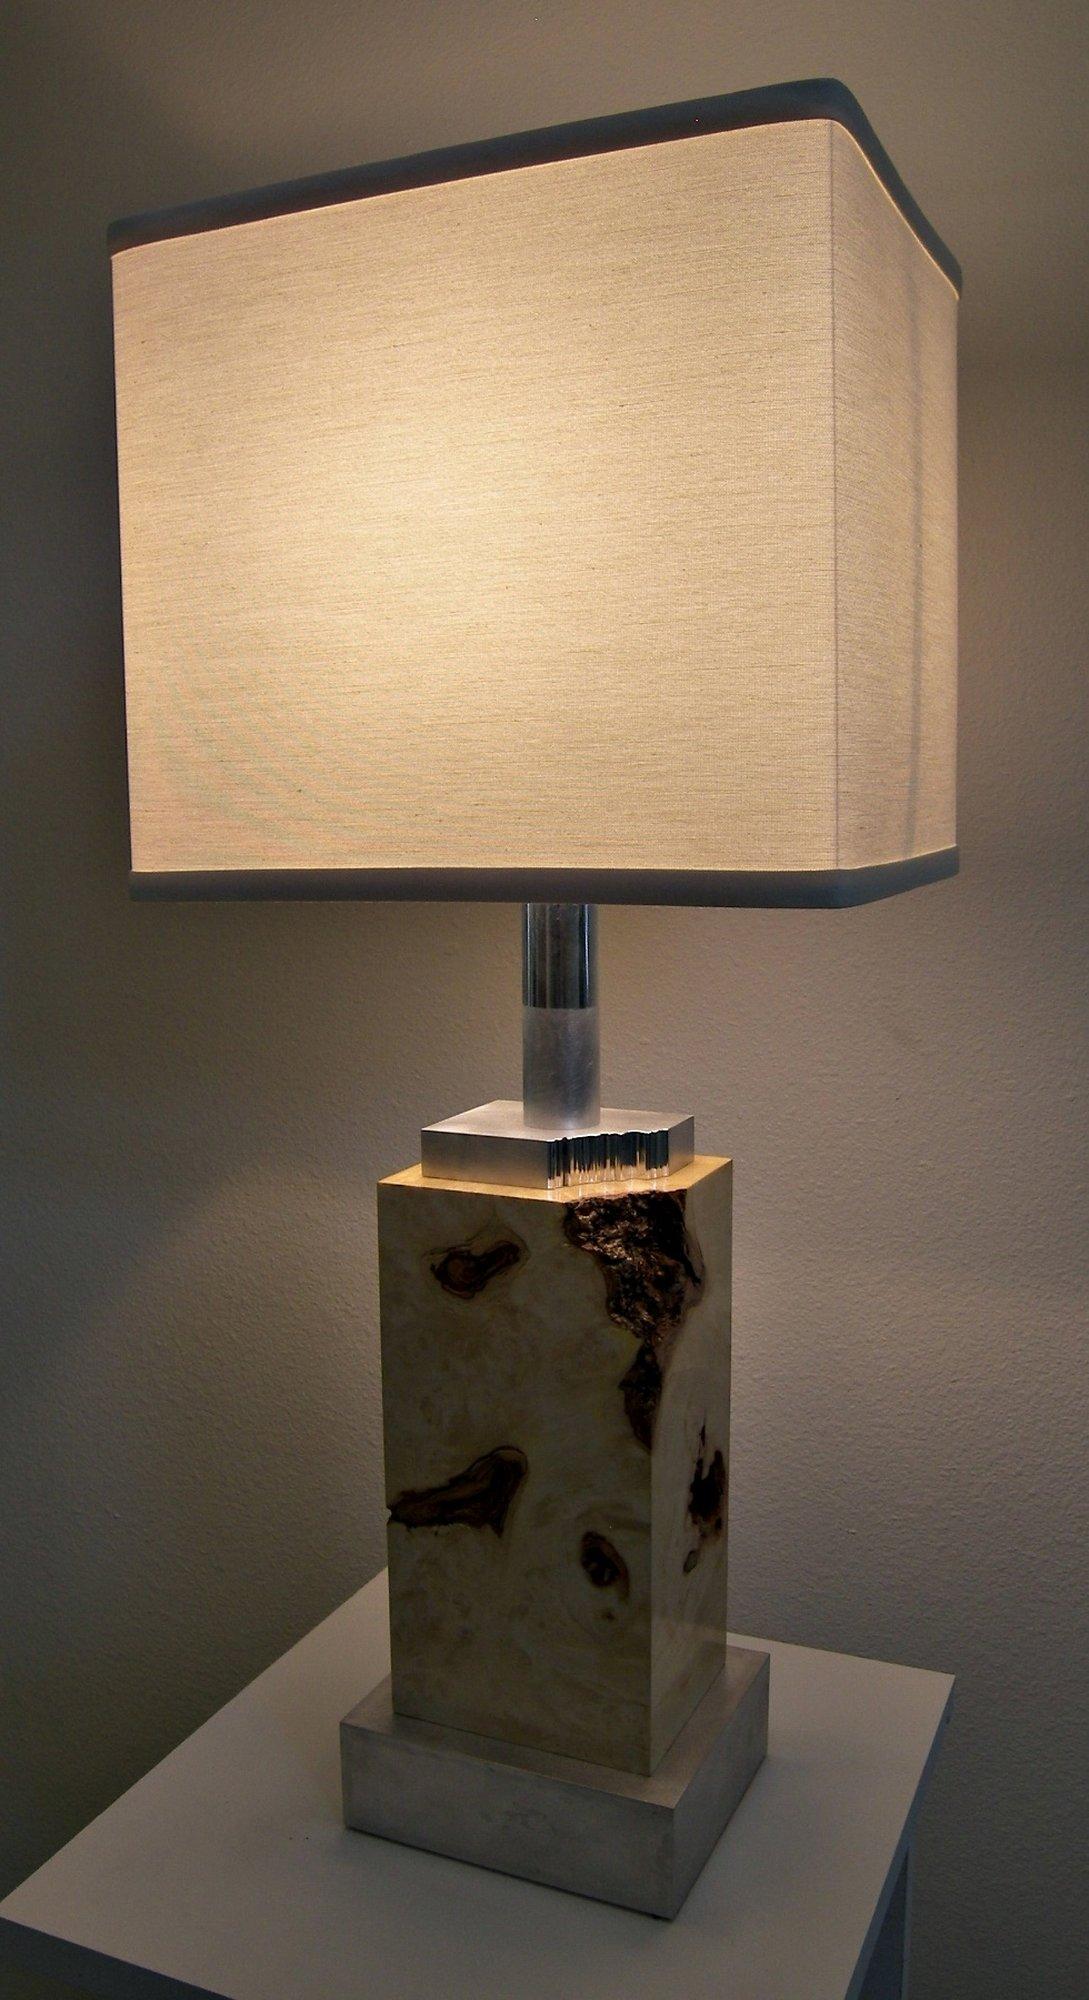 Box elder lamp